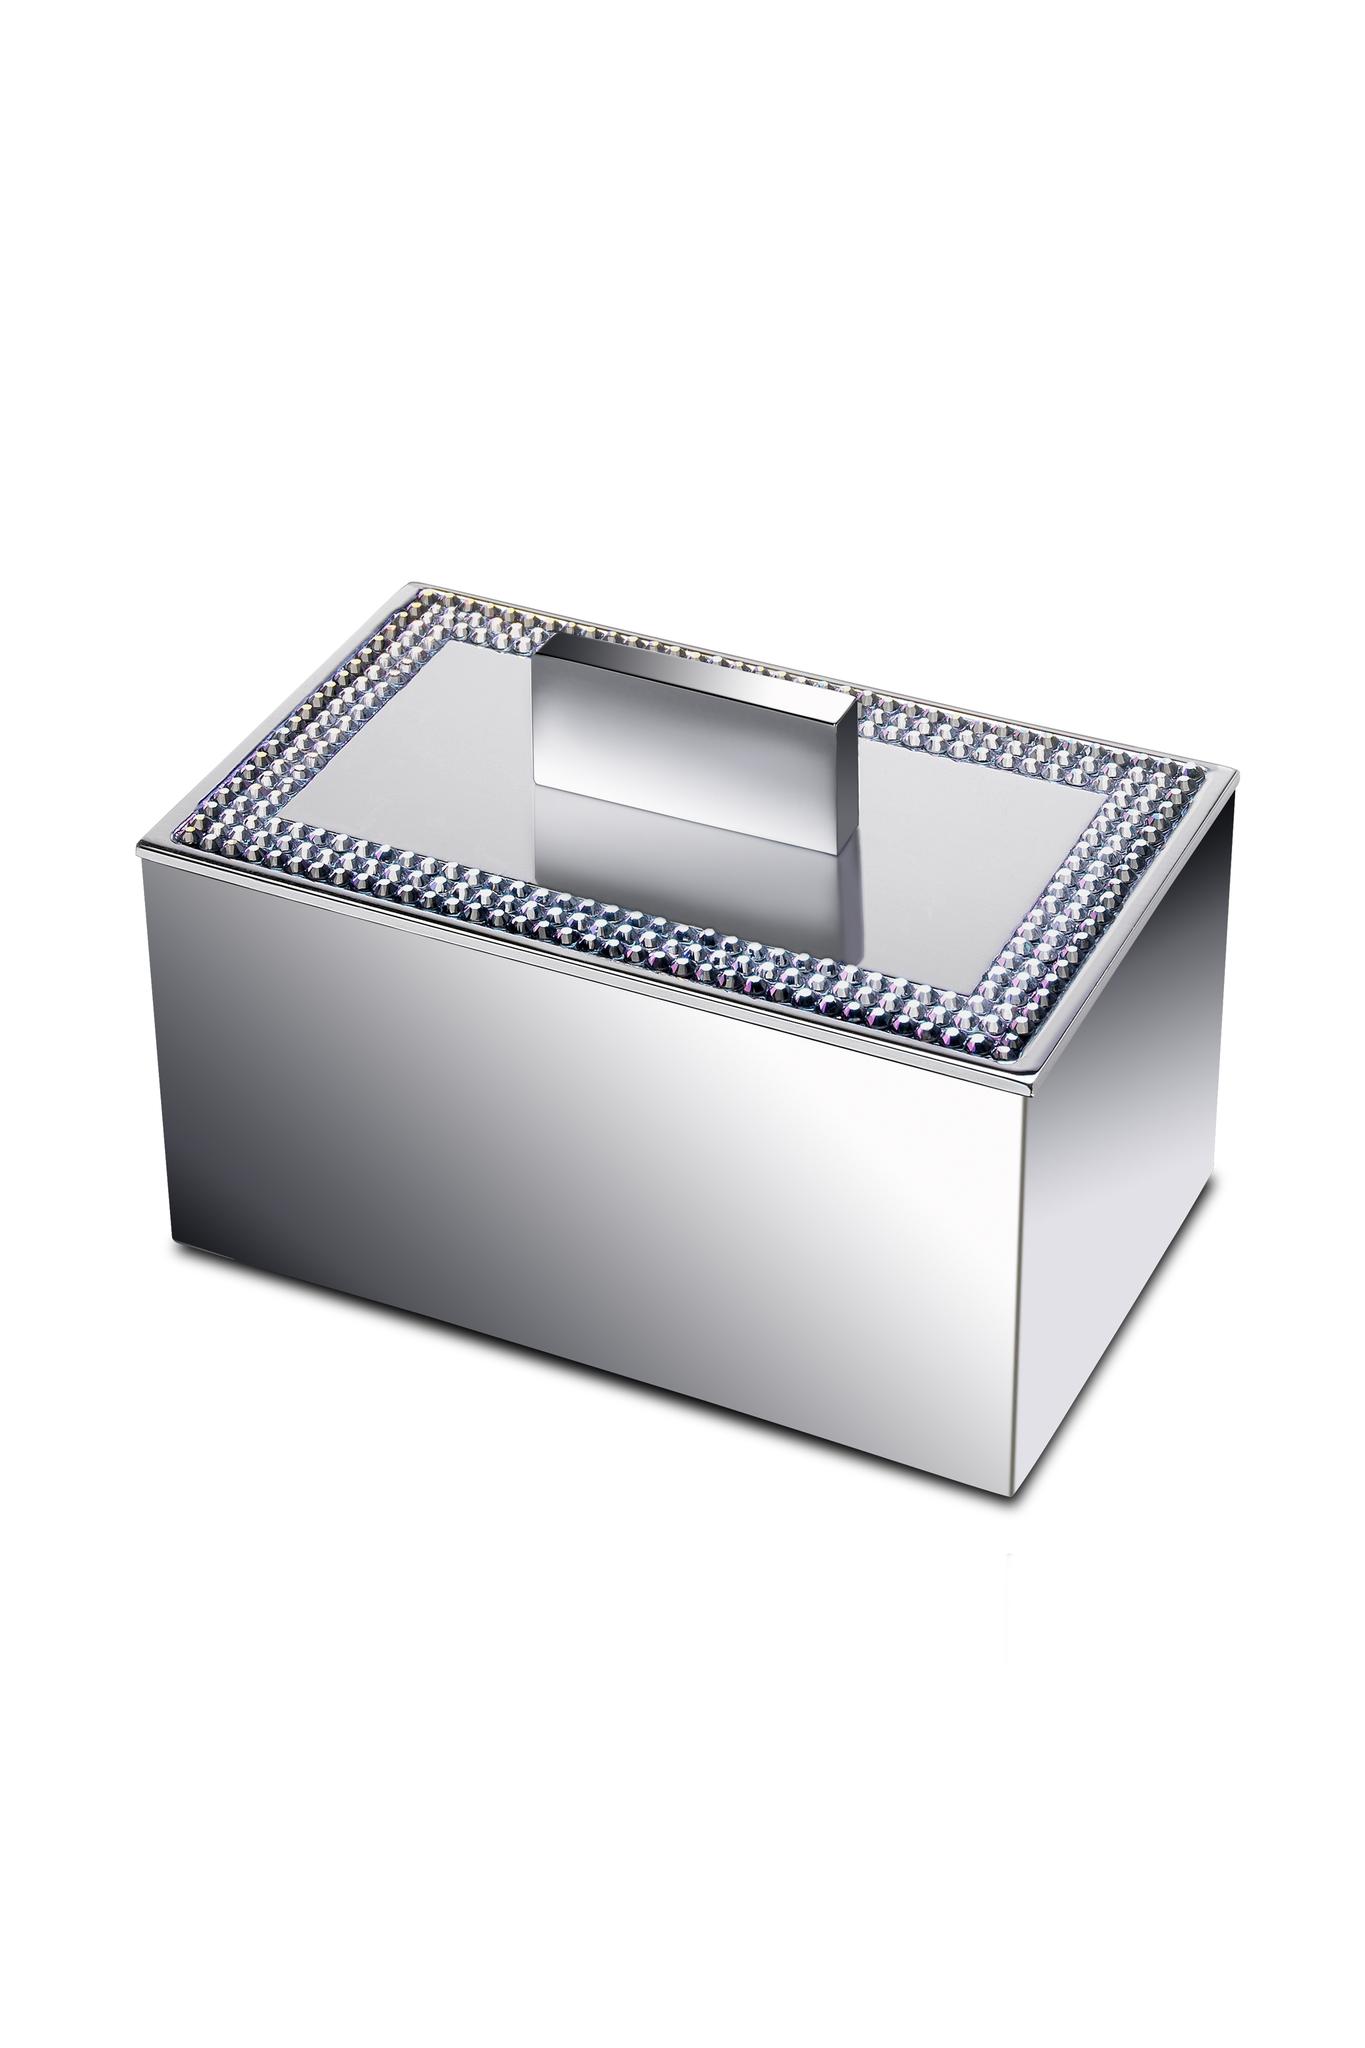 Баночки для косметики Емкость для косметики малая Windisch 88537CR Shine Light Square banochka-malaya-88537-shine-light-ot-windisch-ispaniya.jpg